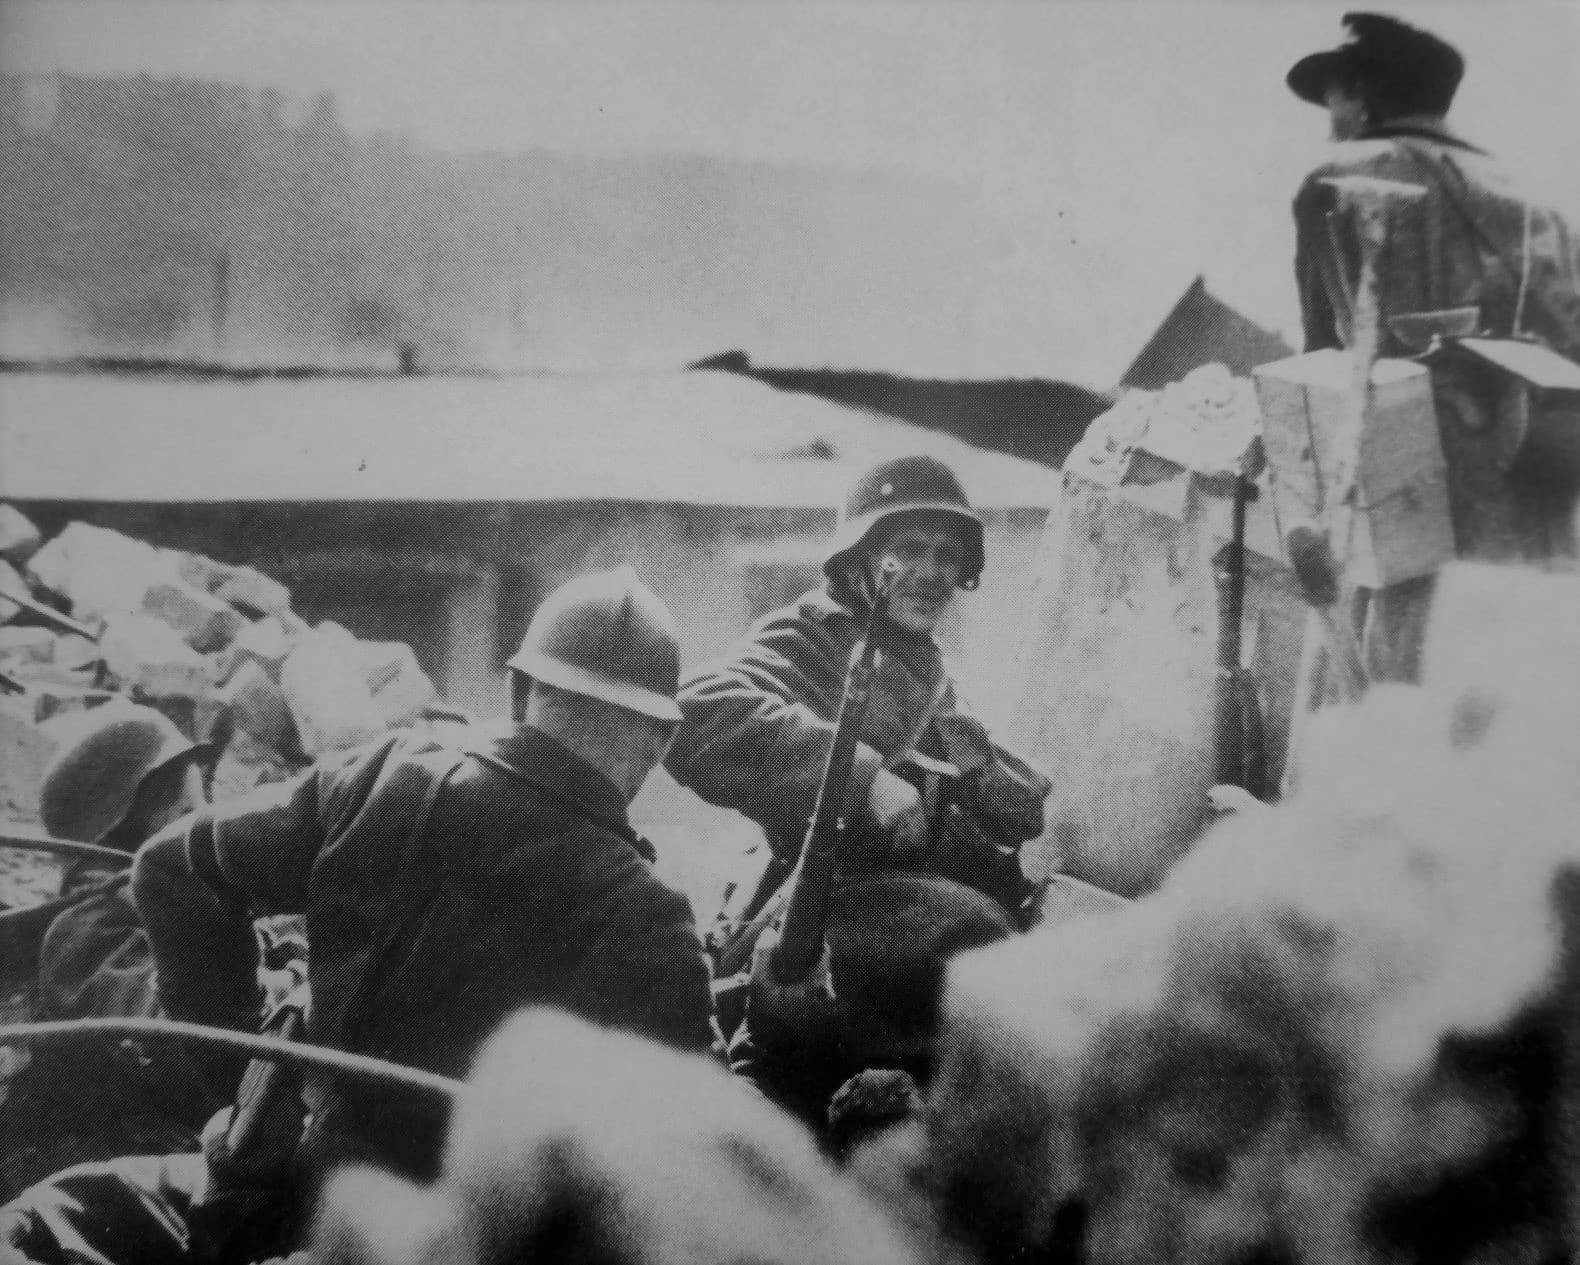 Volkssturm militias continue to maintain a defensive position near the Anhalter Bahnhof in Berlin.